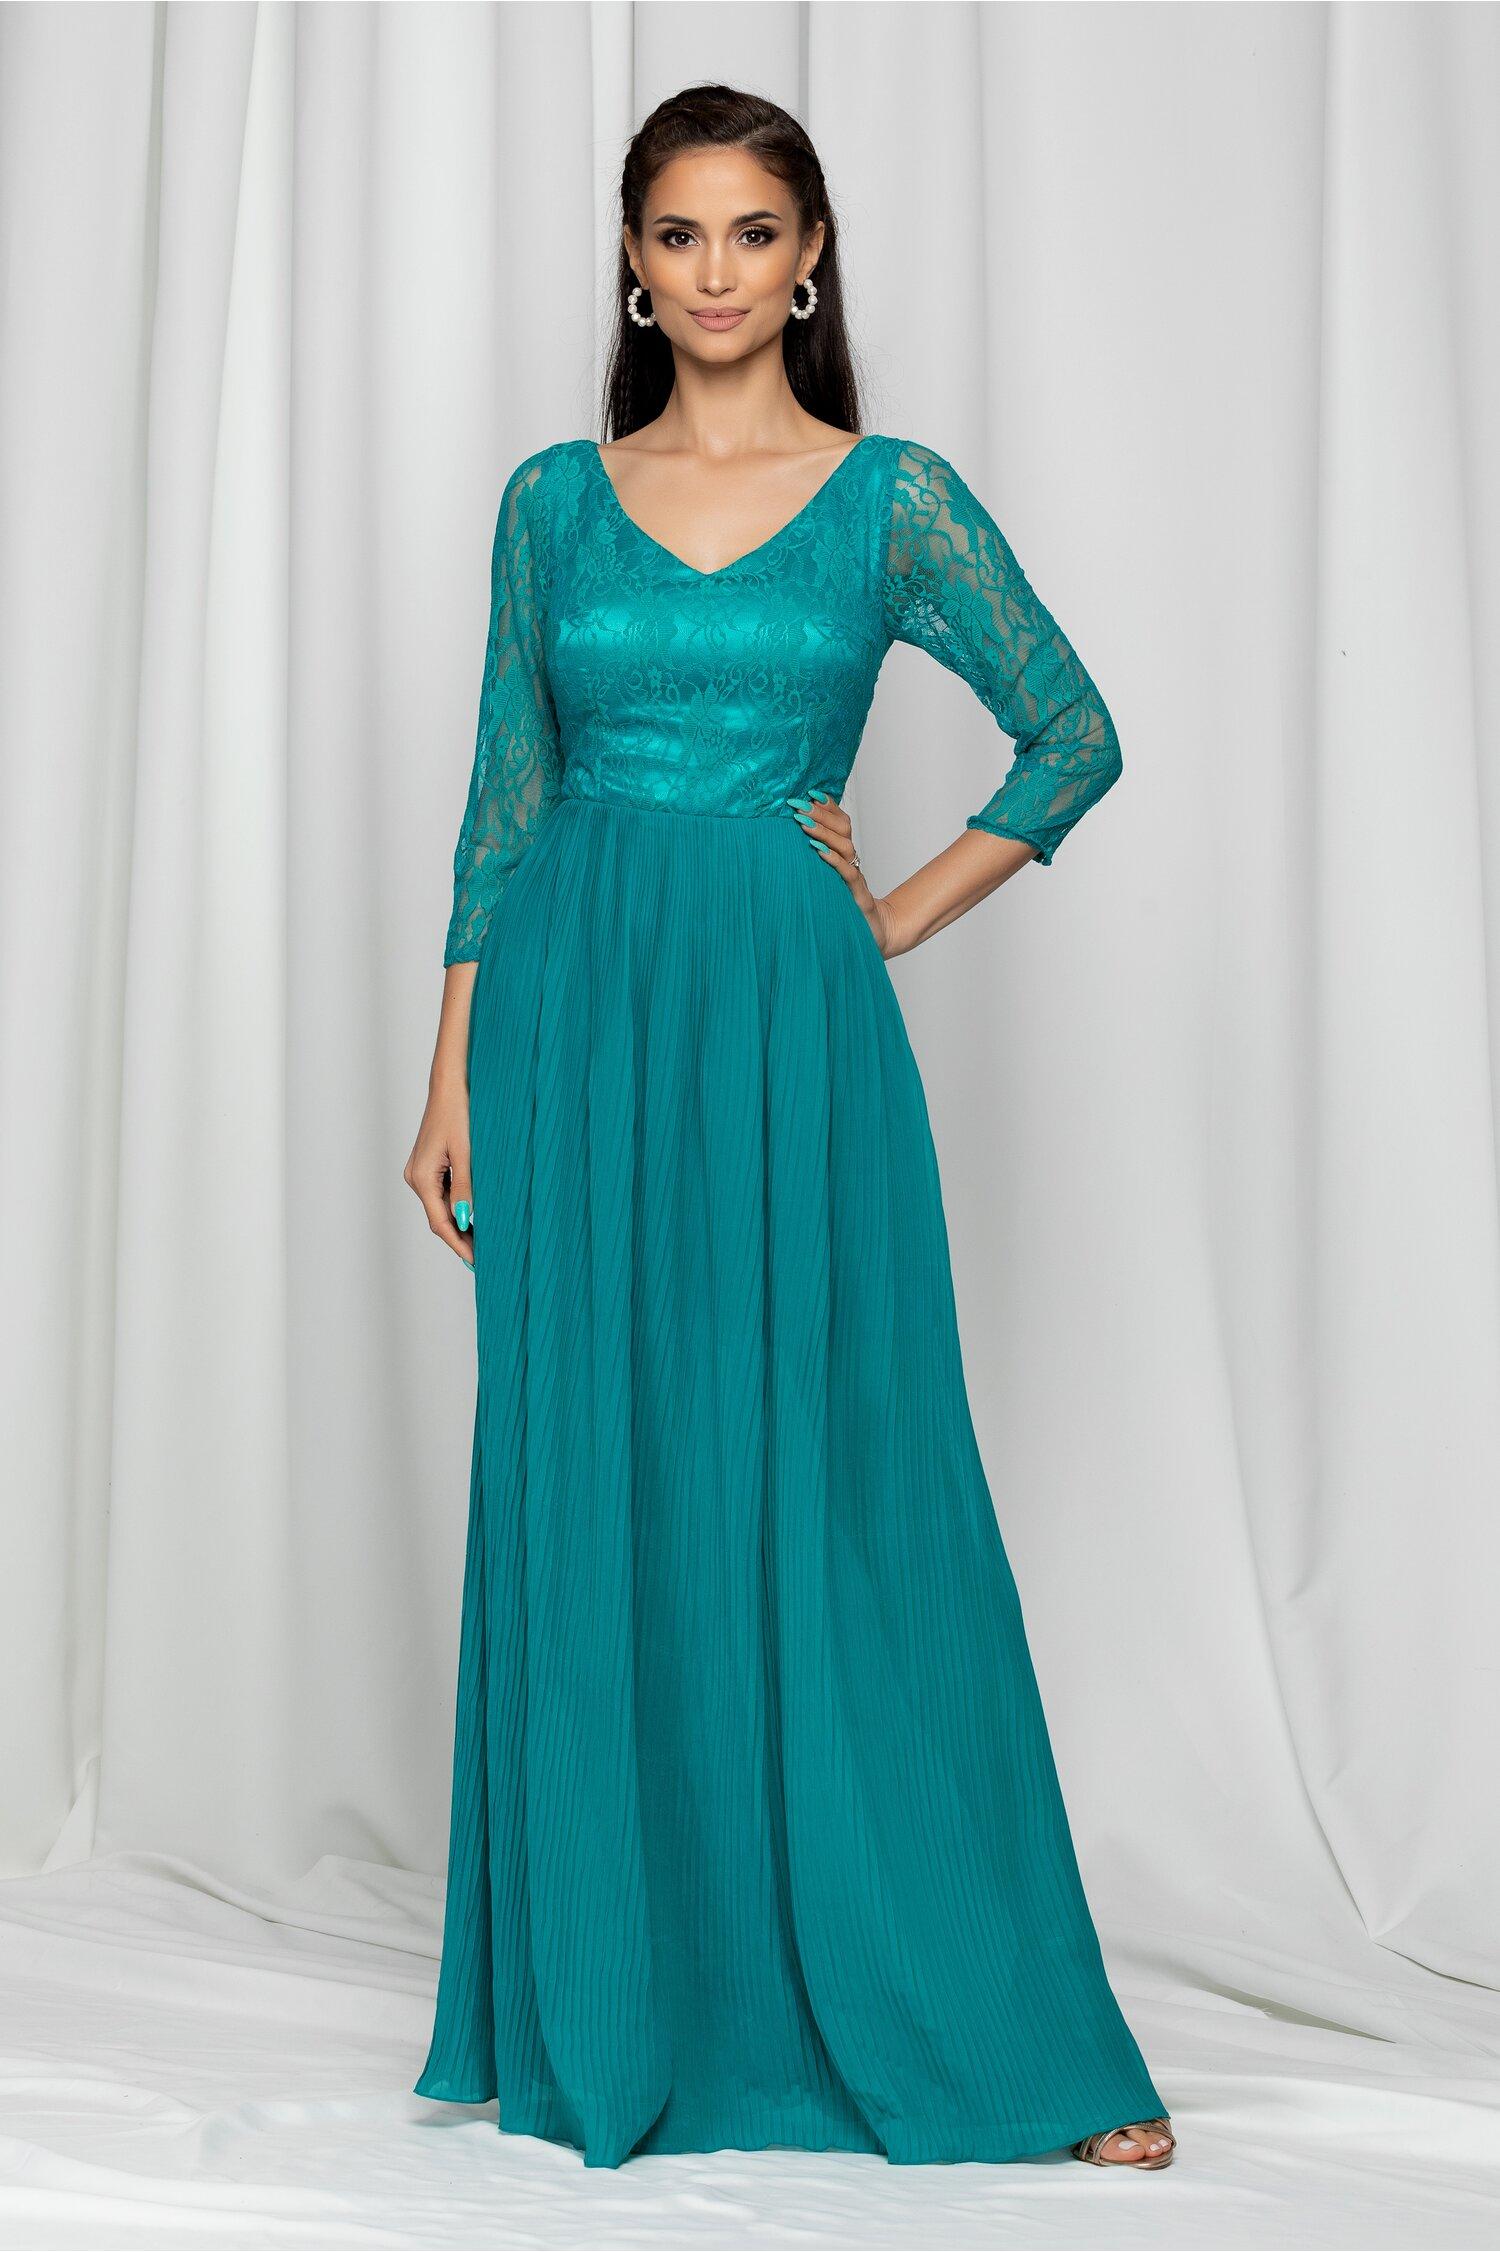 Rochia Eleonora verde cu dantela si maneci trei sferturi